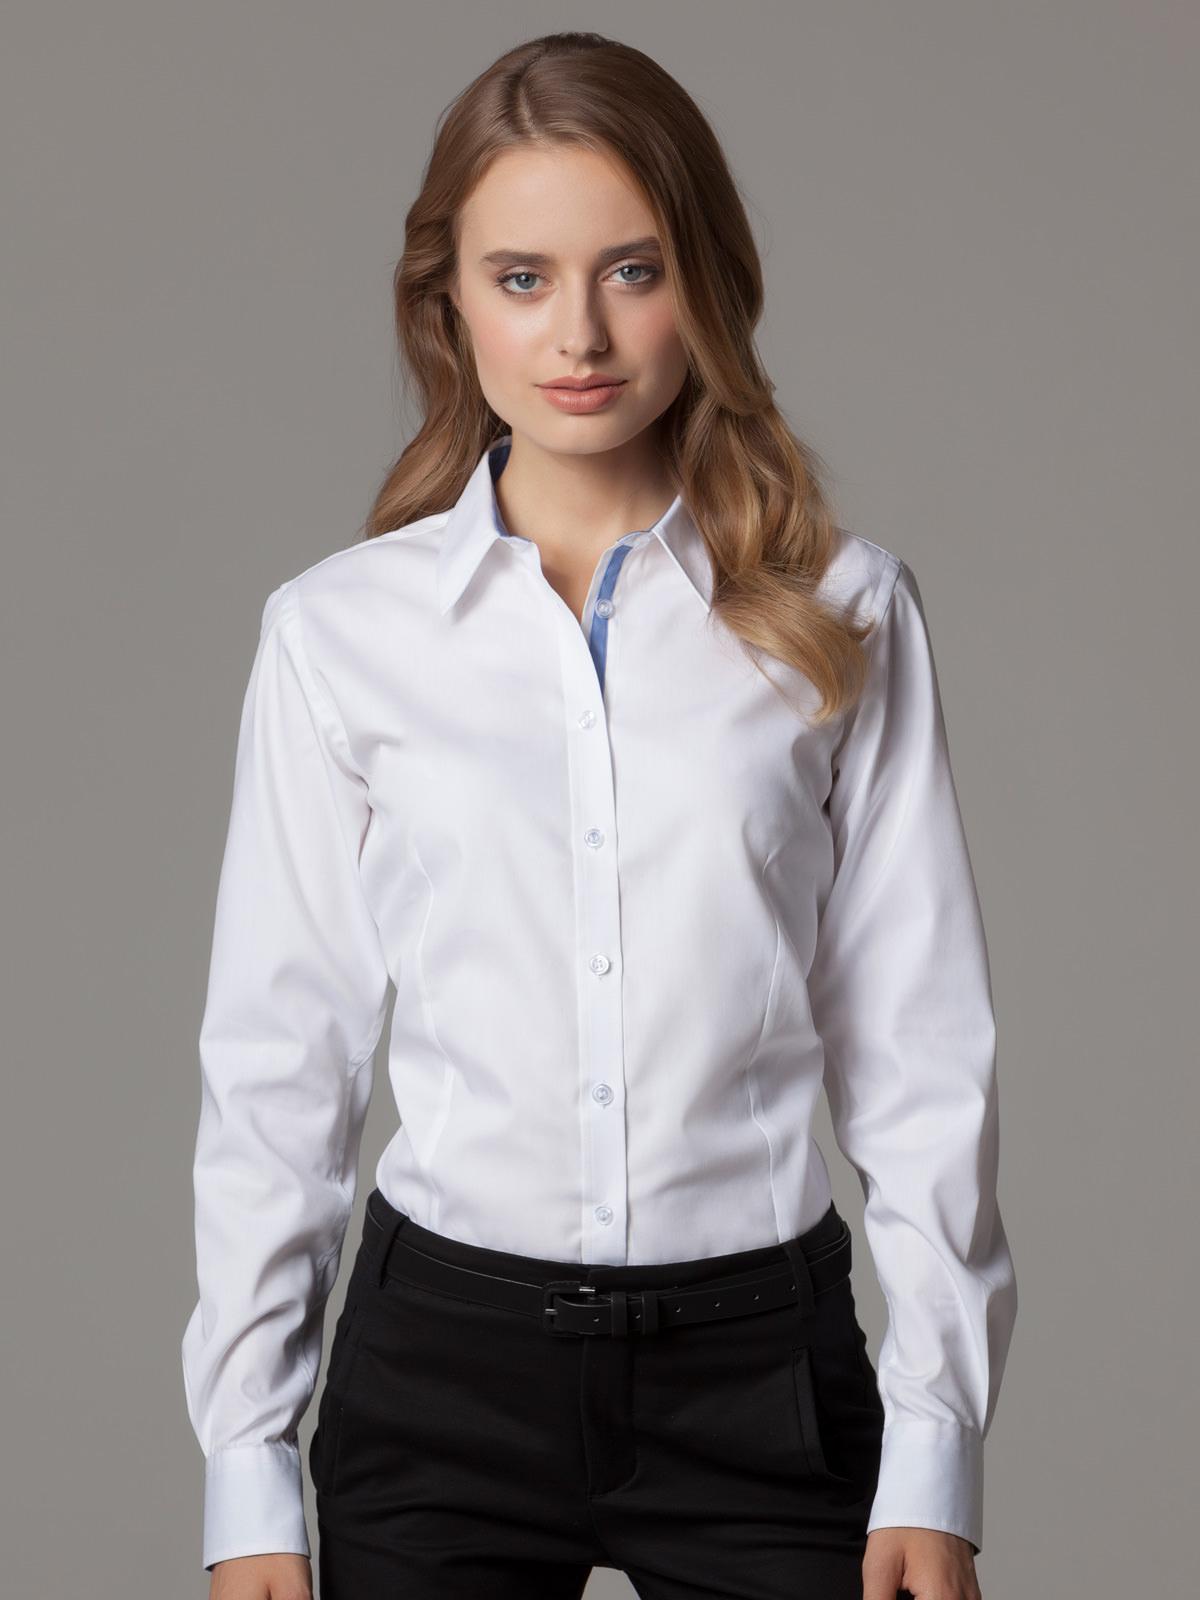 Kk790 Women S Contrast Premium Oxford Shirt Long Sleeve